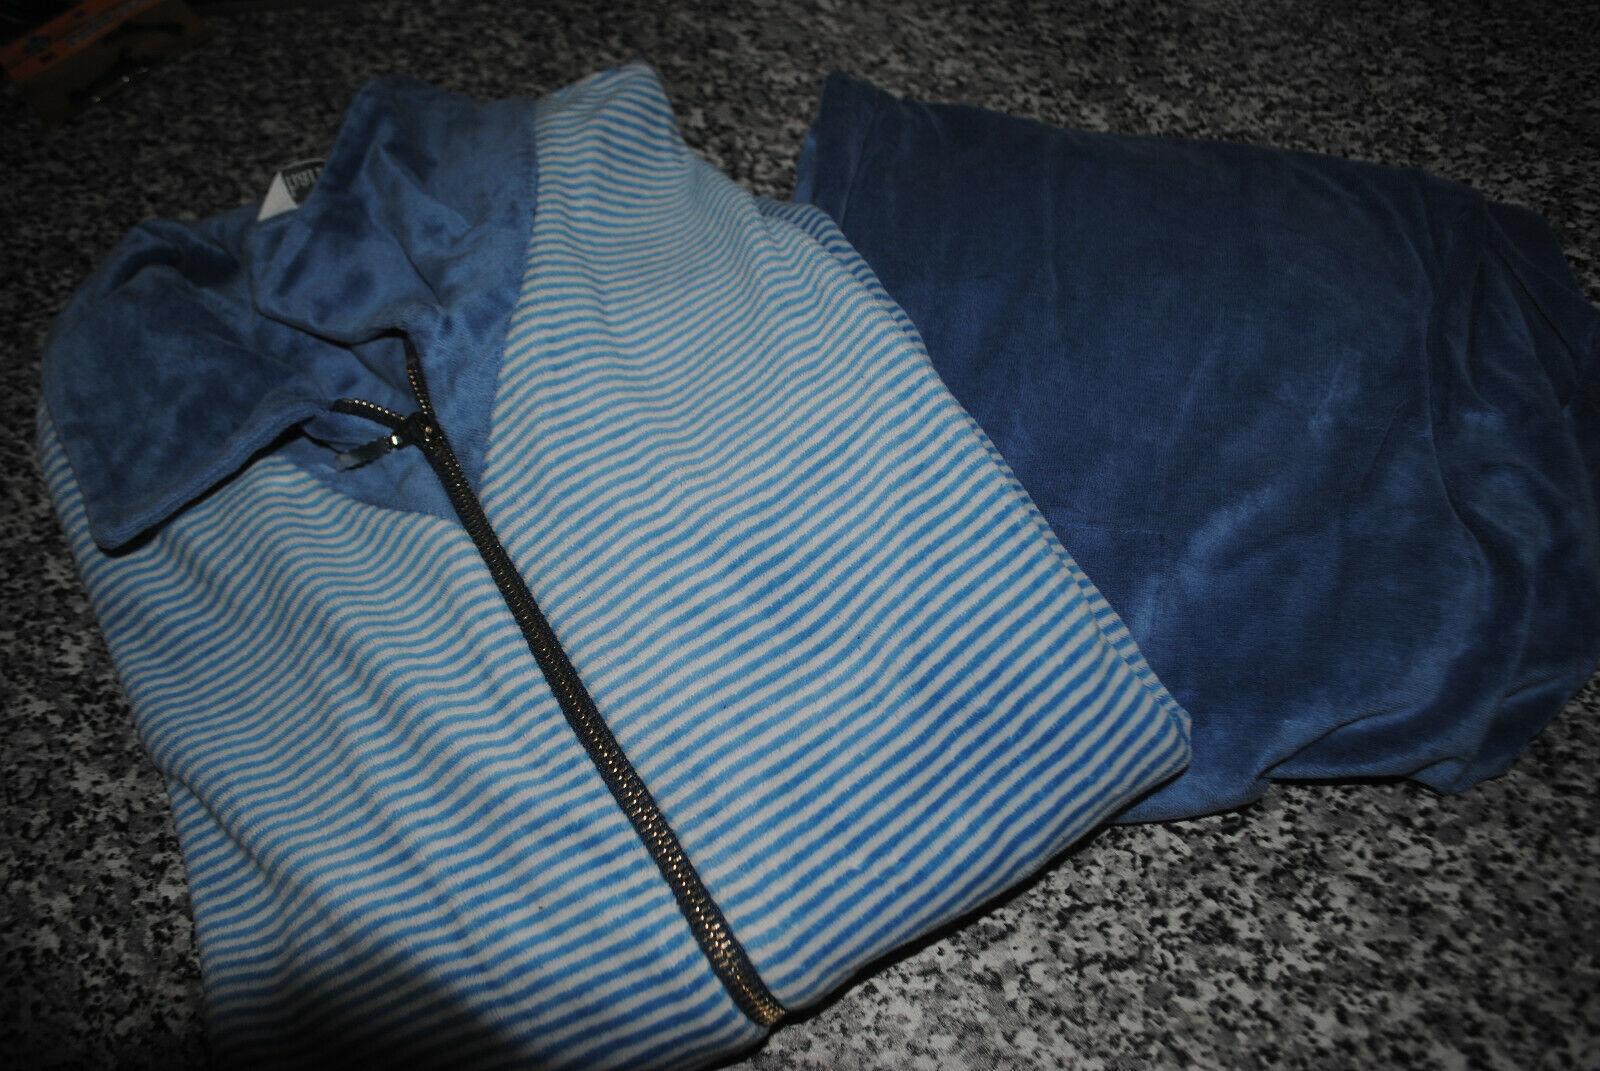 Charmor Jogginganzug Hausanzug Schlafanzug Hose Und Jacke blau Gr. 50